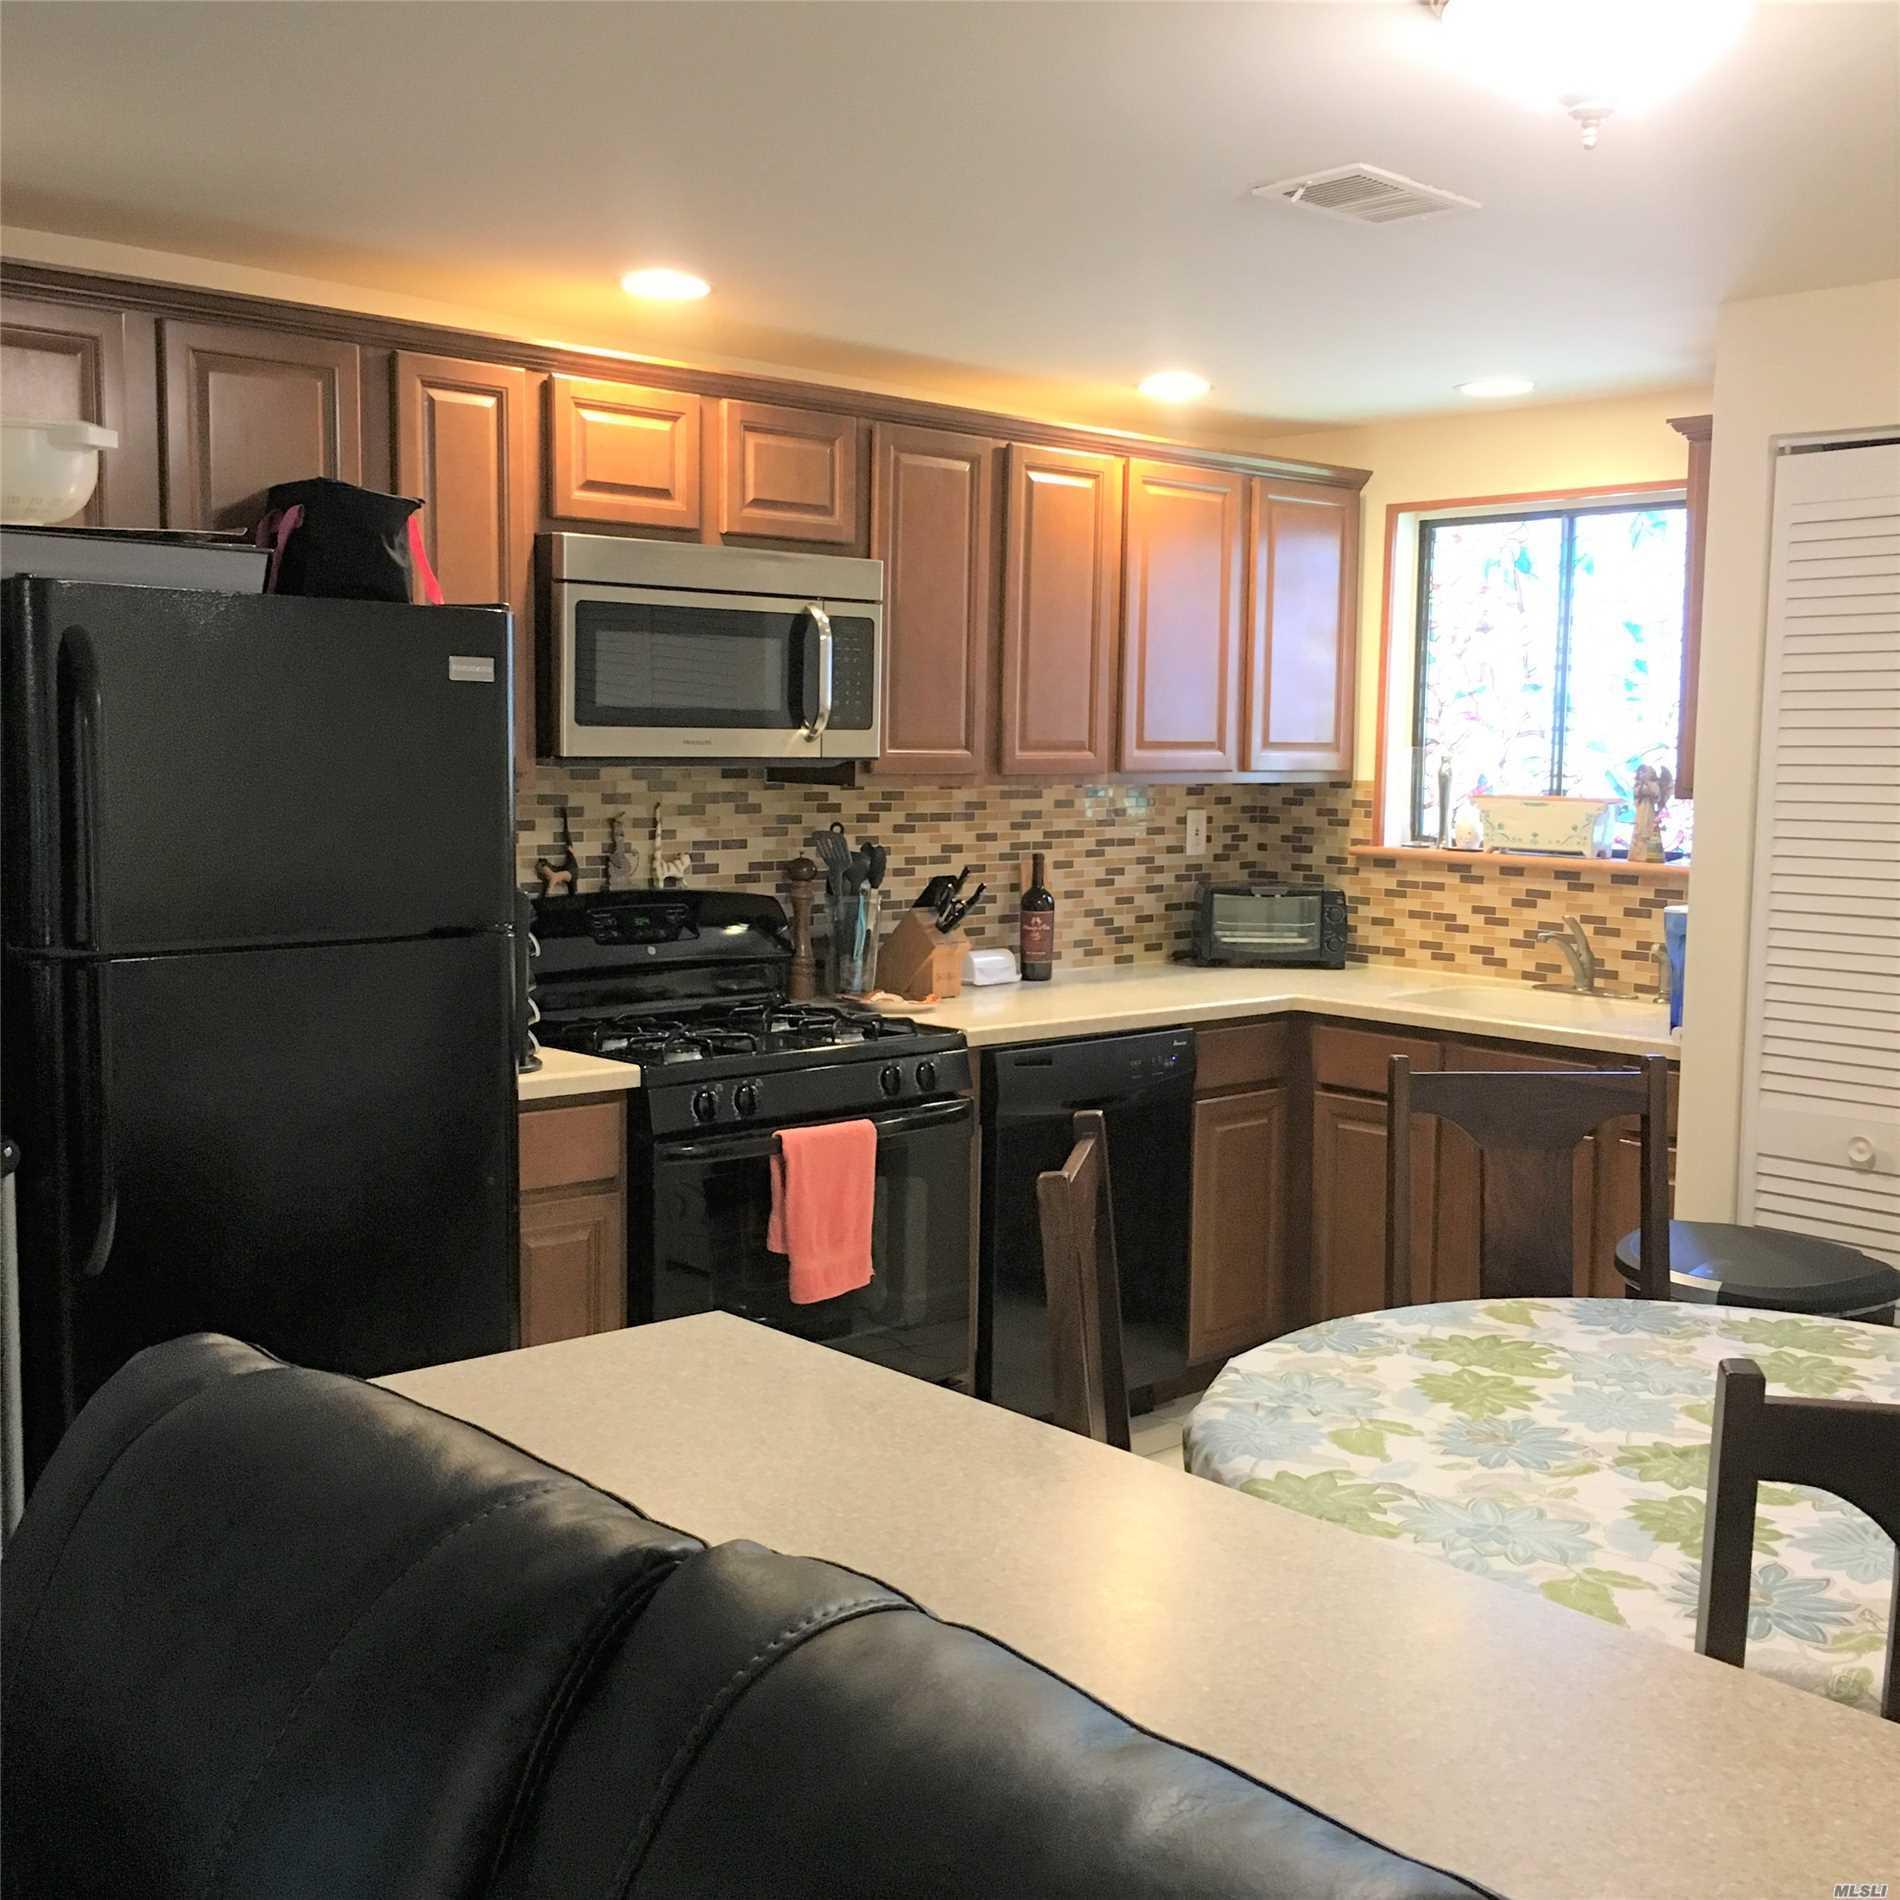 Property for sale at 7 Birchwood Dr, Pt.Jefferson Sta,  NY 11776